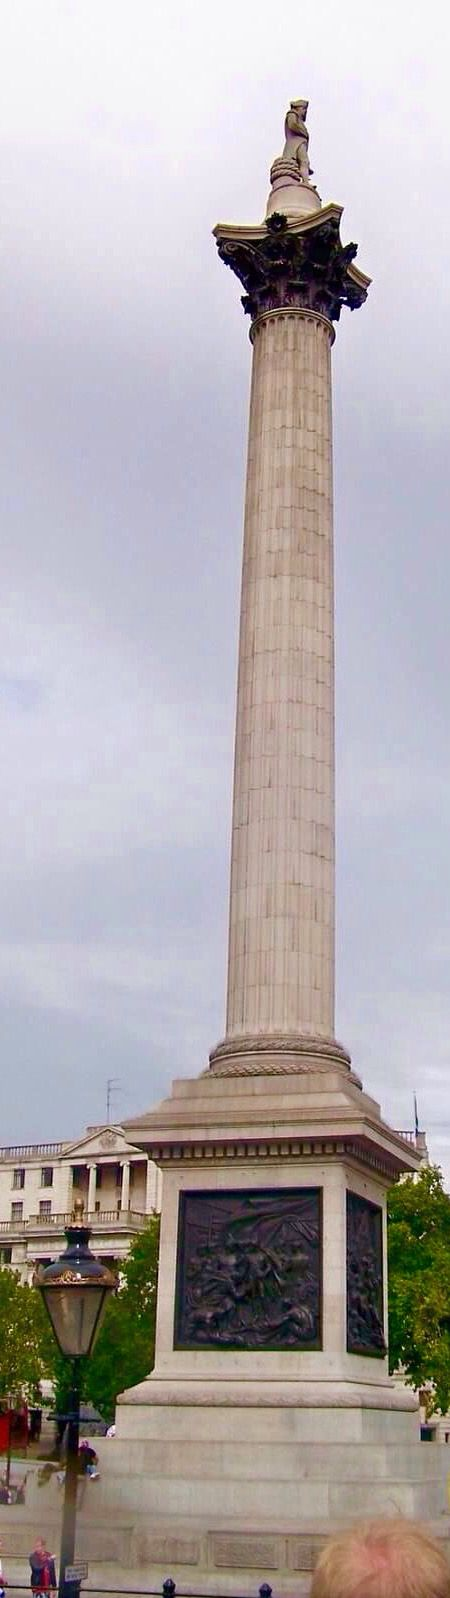 Nelson's Column in Trafalgar Square,London,England